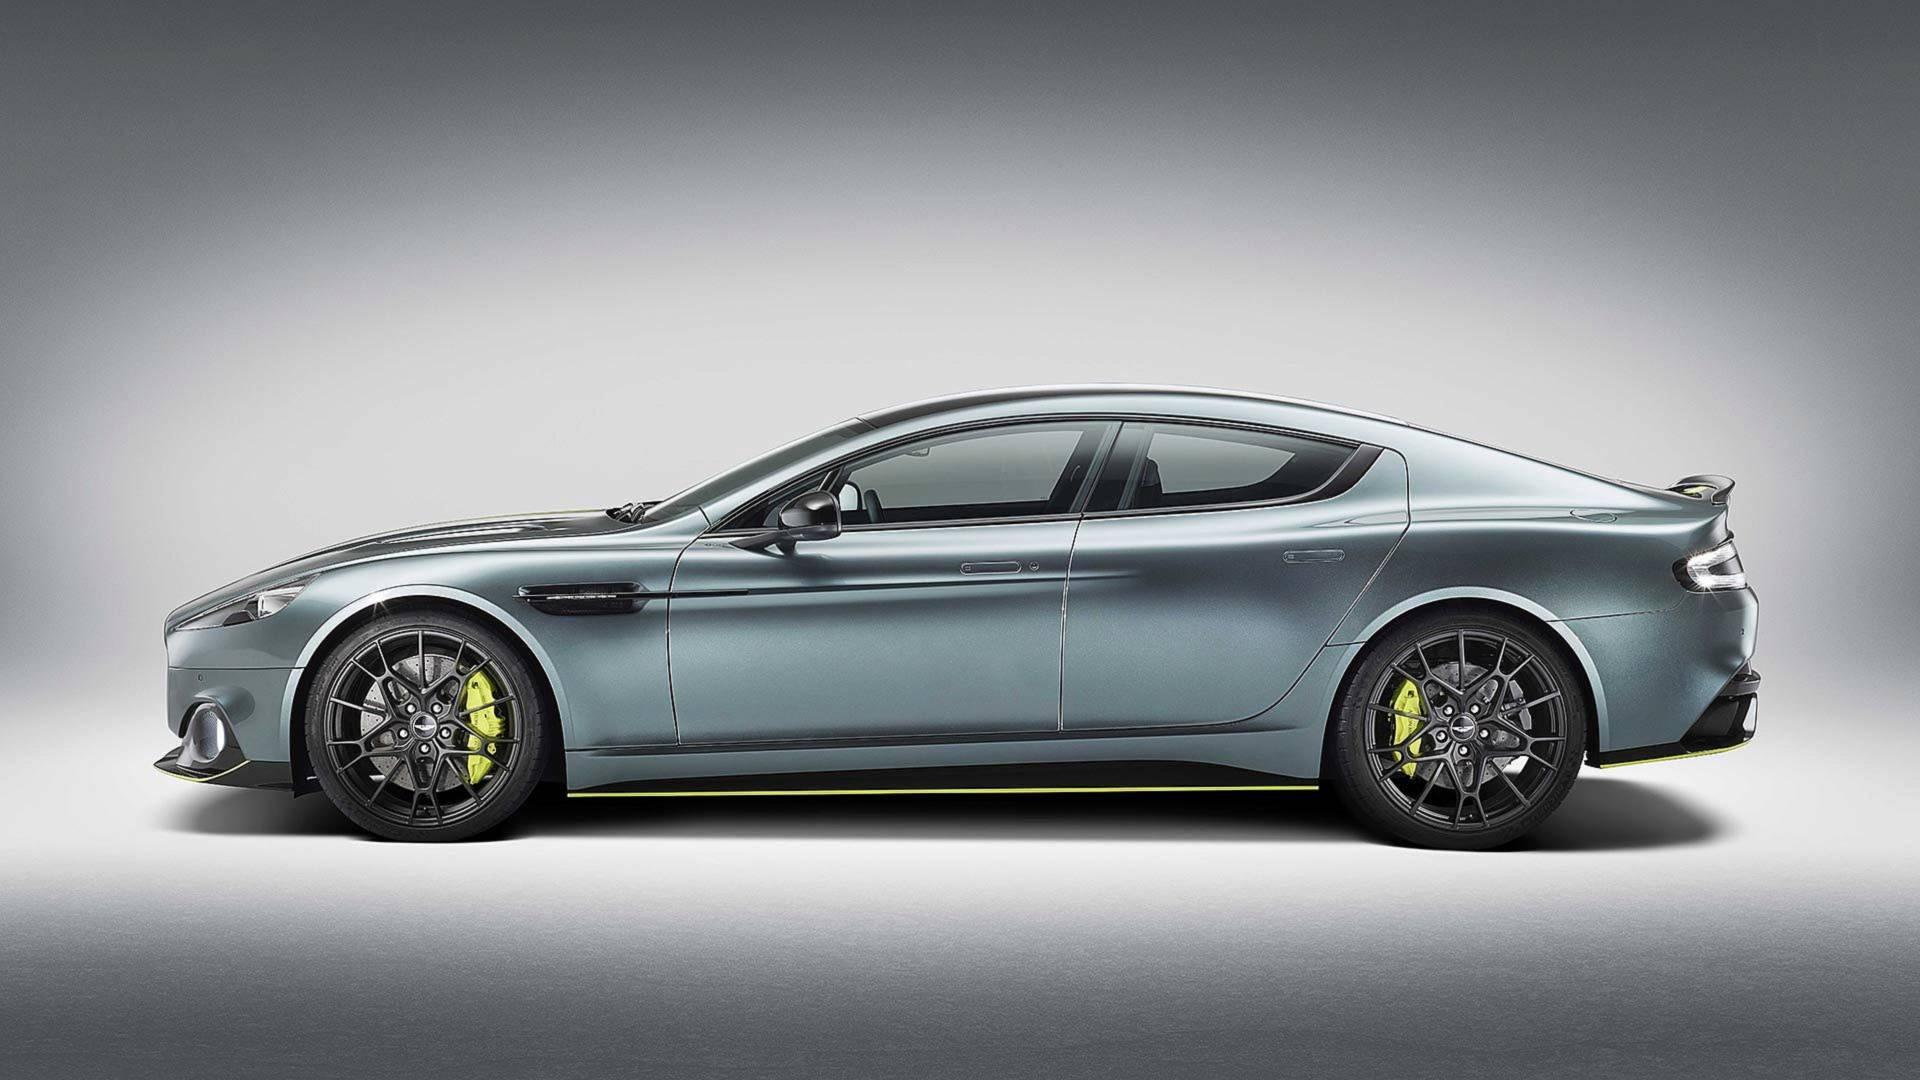 Aston Martin Rapide Amr Packs 580 Bhp Gets Carbon Fibre Body